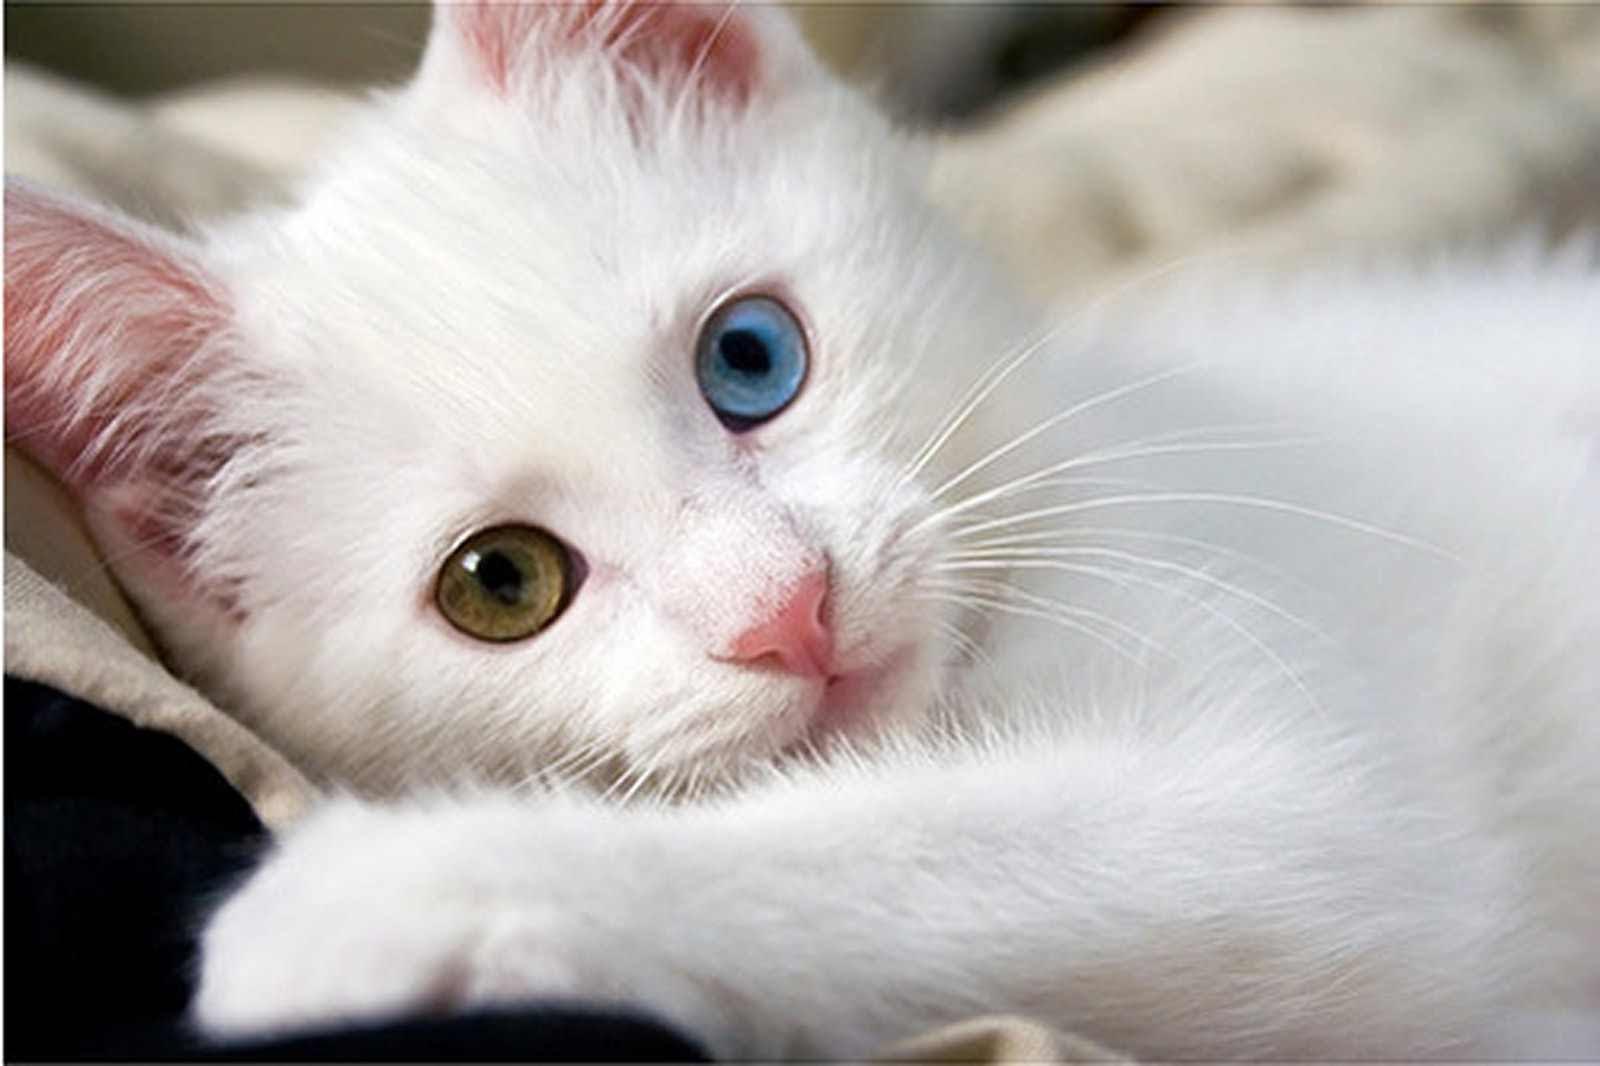 صور صور قطط كيوت , صورة اجمل قطة شيرازى كيوت